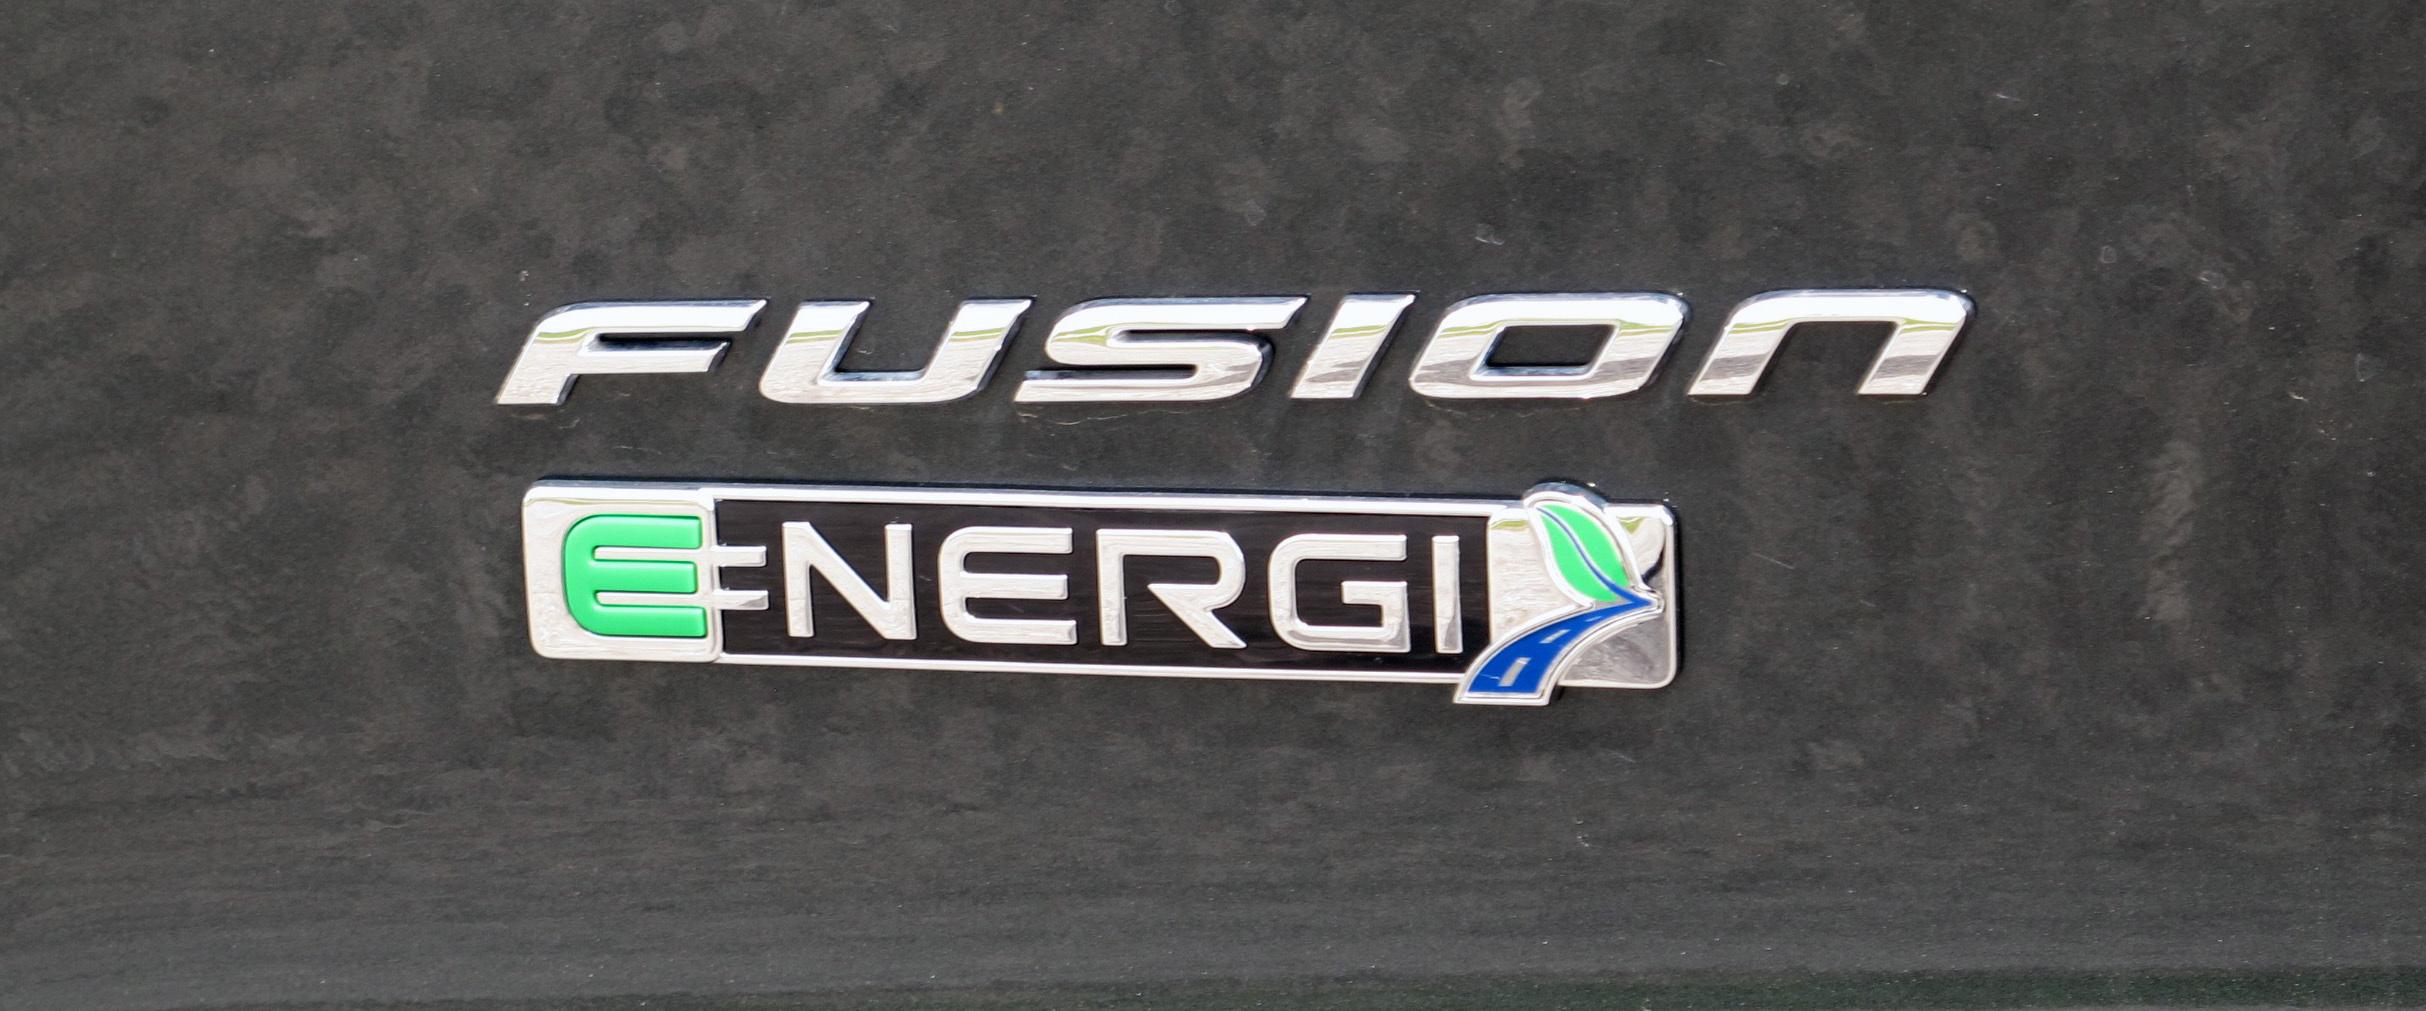 2015 Ford Fusion Energi logo